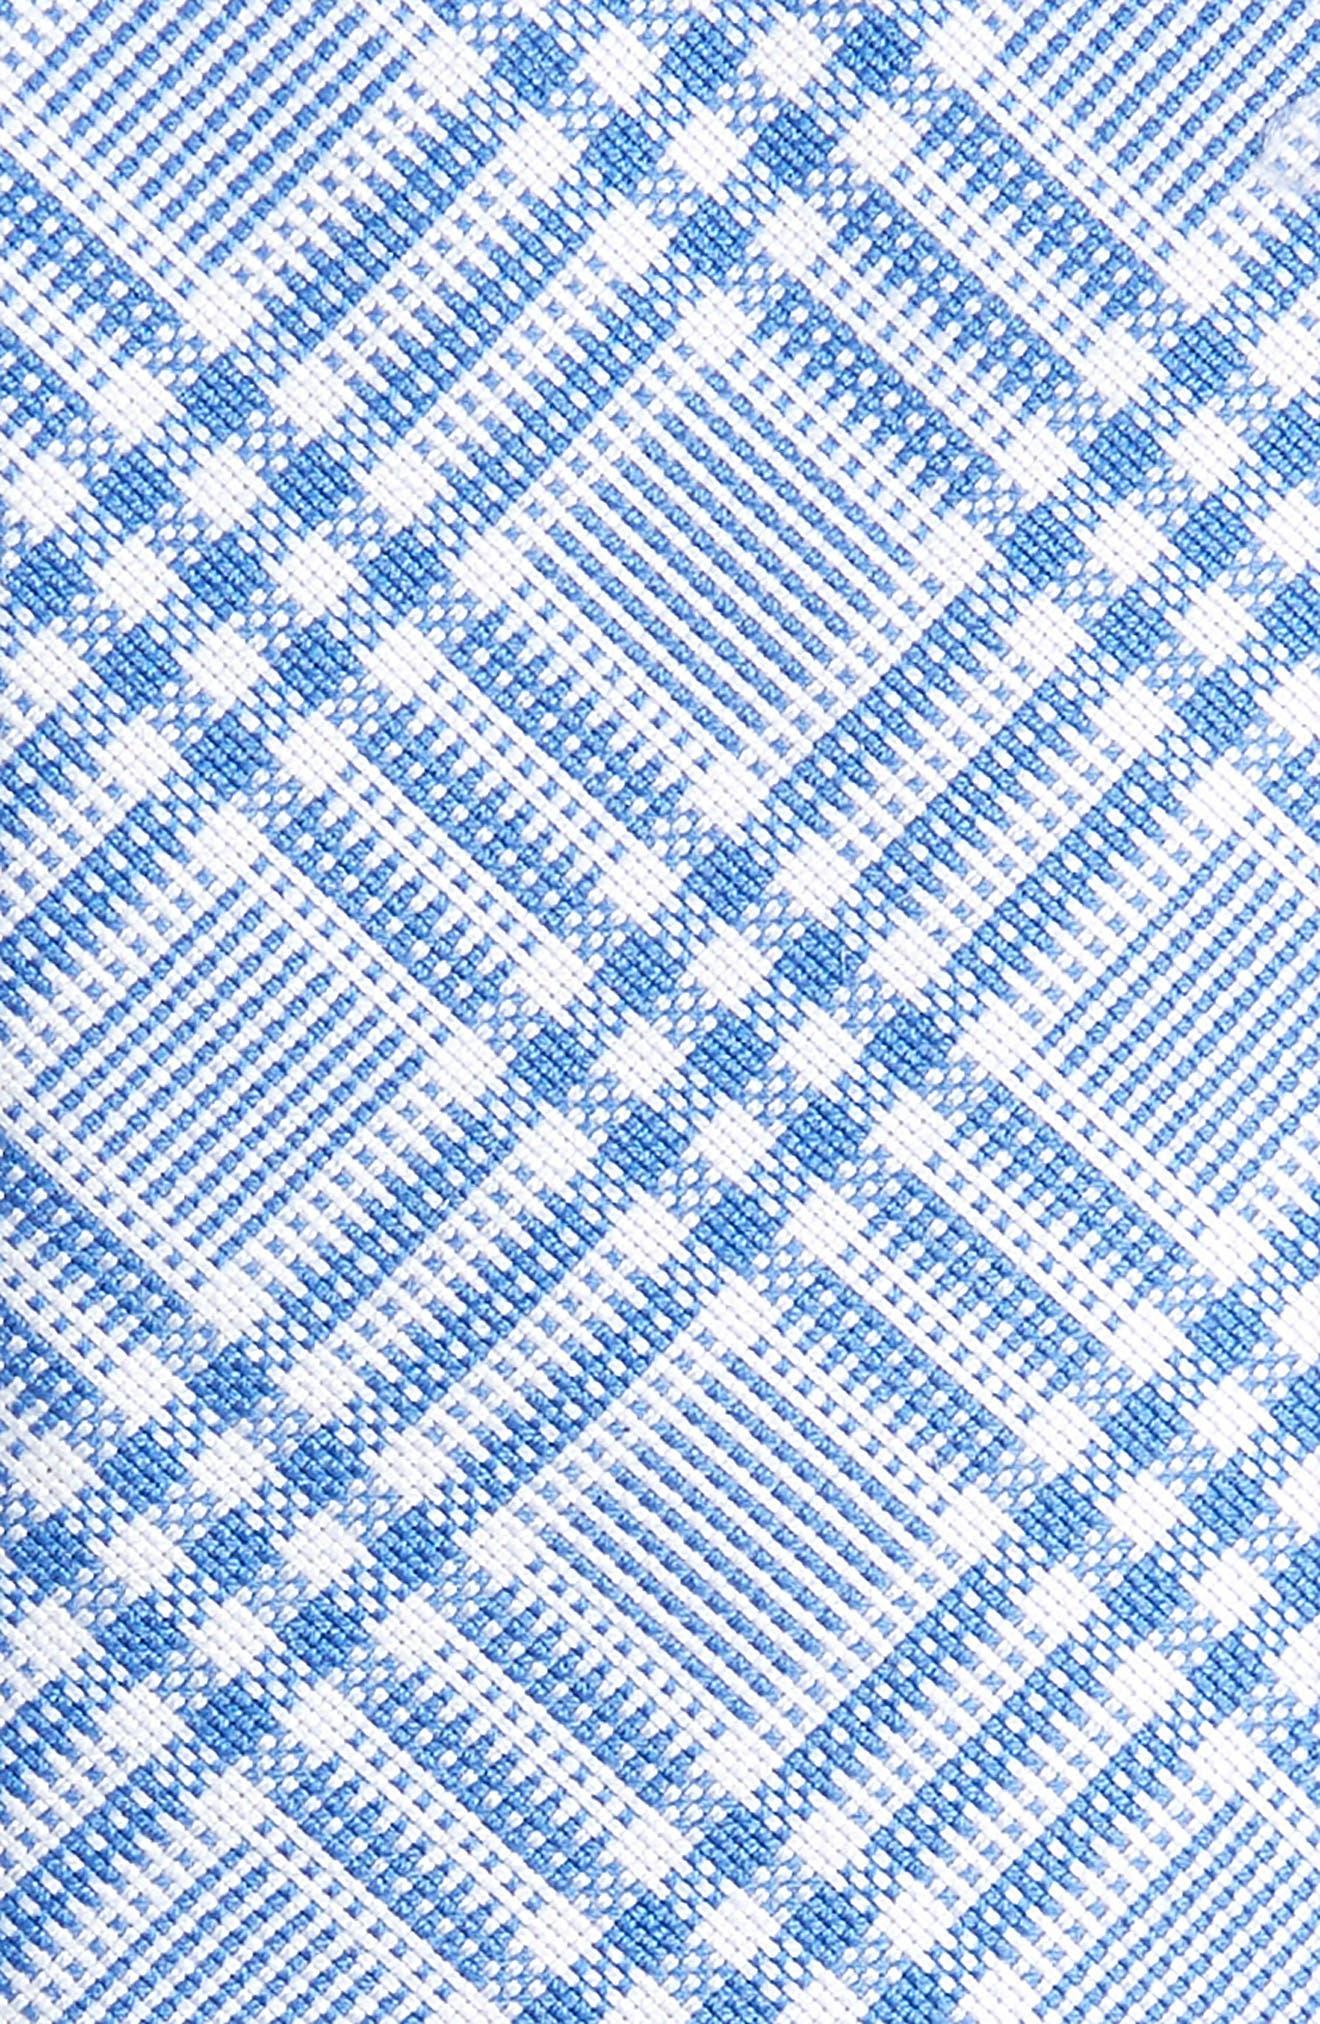 Brook Plaid Cotton Skinny Tie,                             Alternate thumbnail 2, color,                             Blue